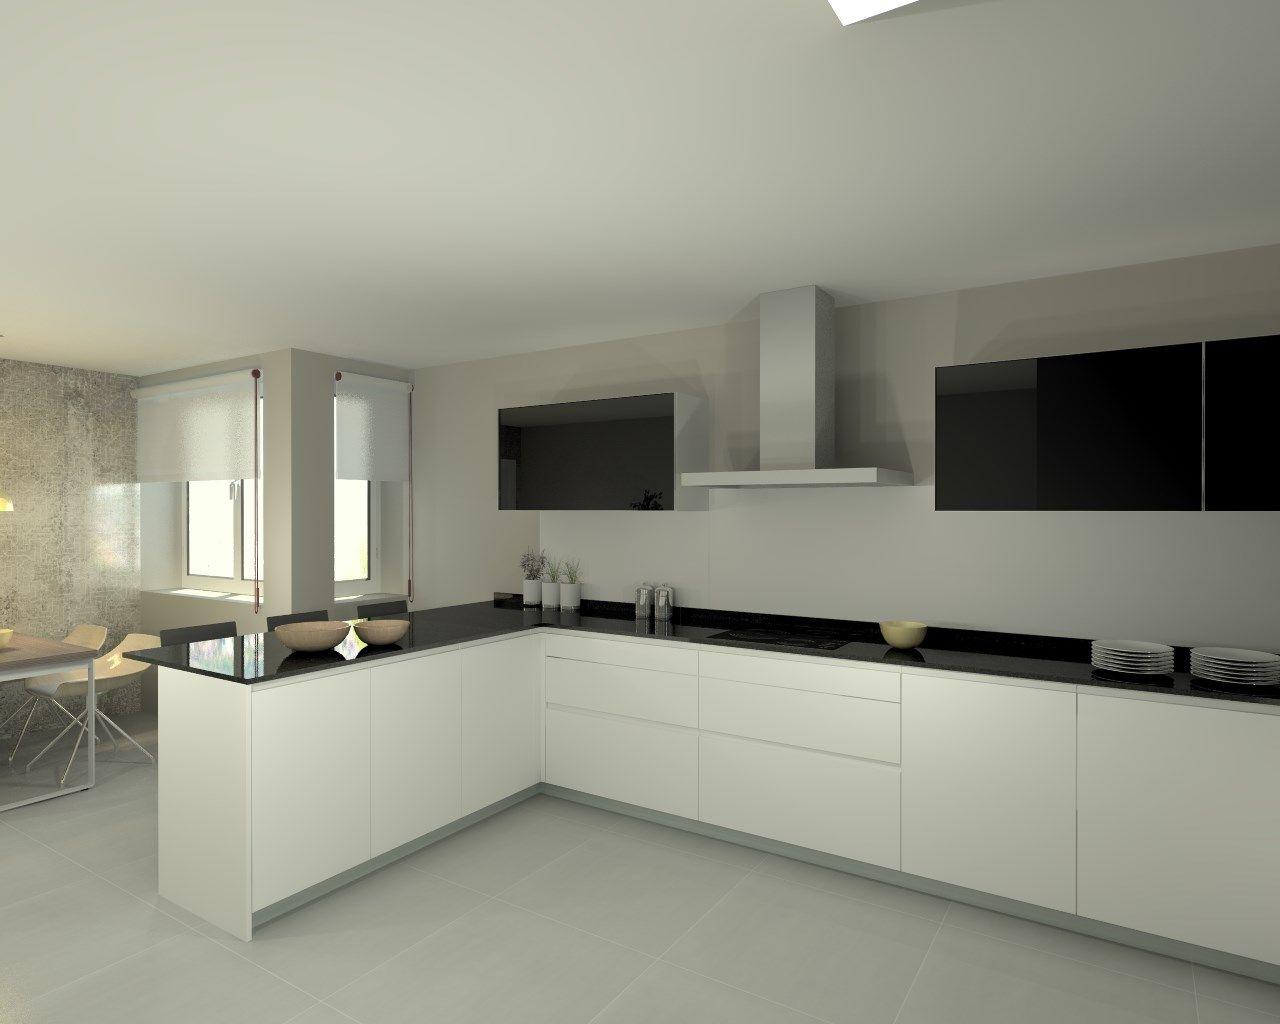 Cocina santos modelo line e blanco con encimera granito for Encimera cocina granito